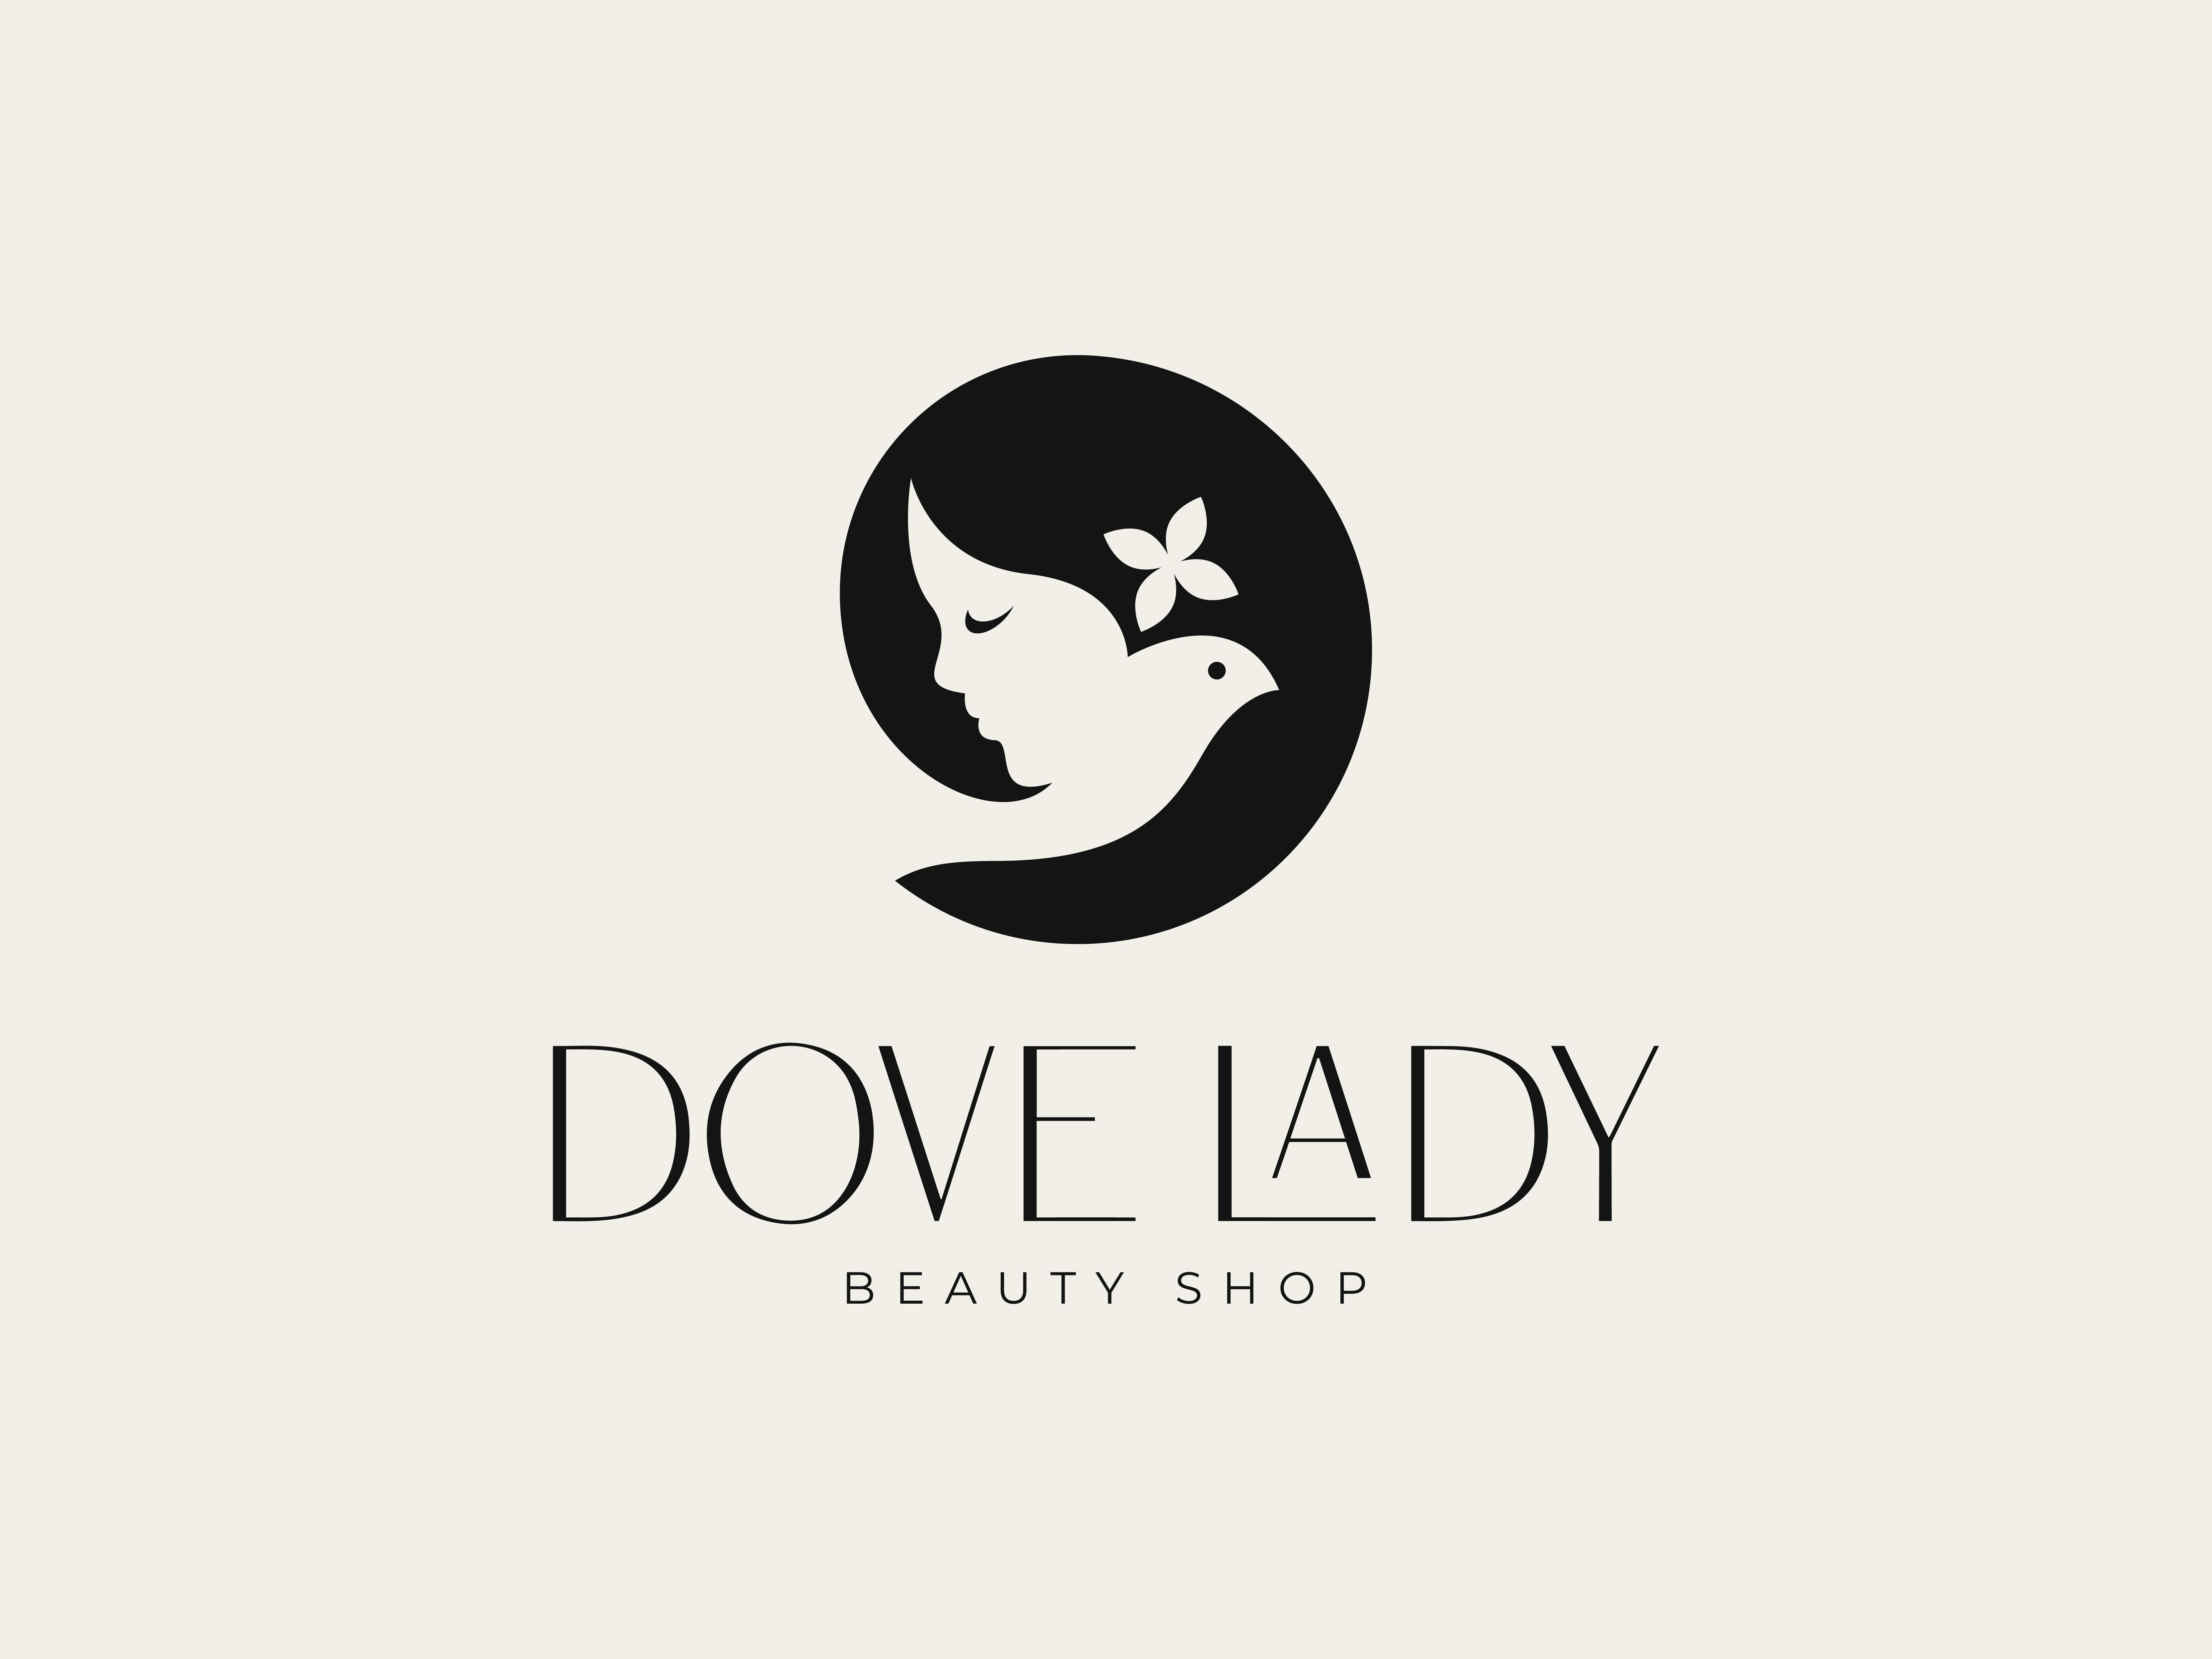 Dove lady dribbble 01